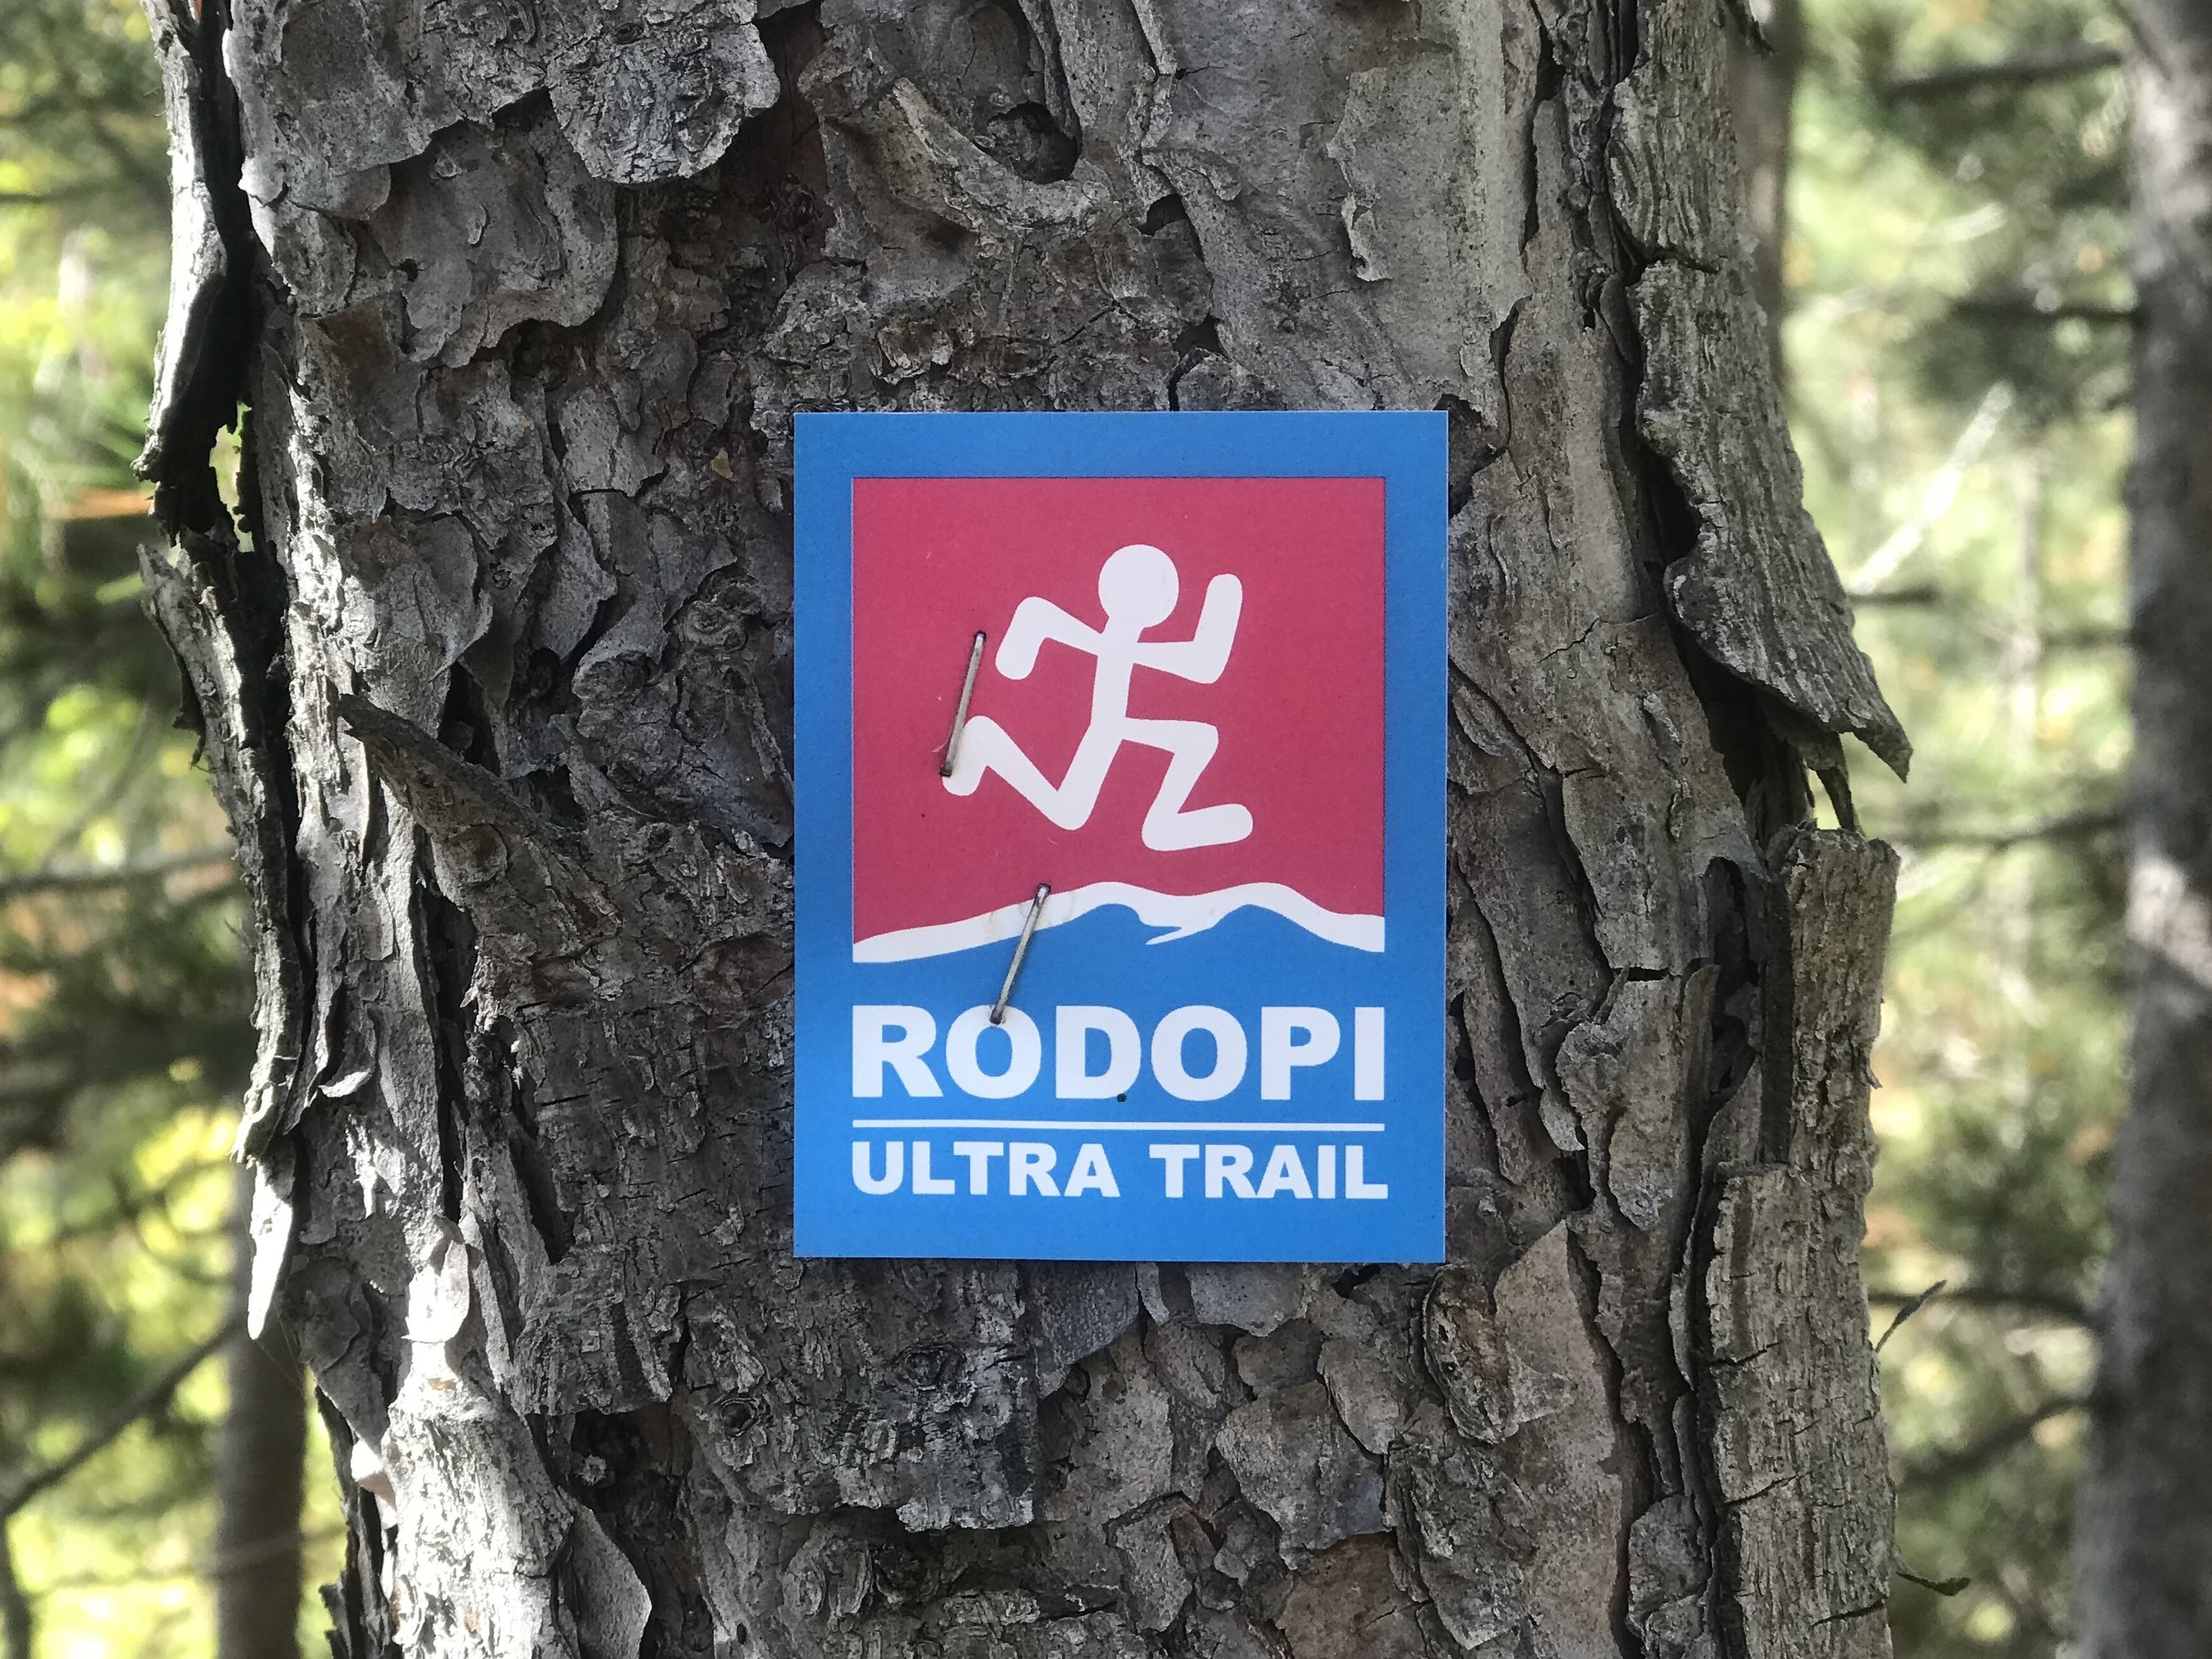 rodopi-ultra-marathon.jpeg